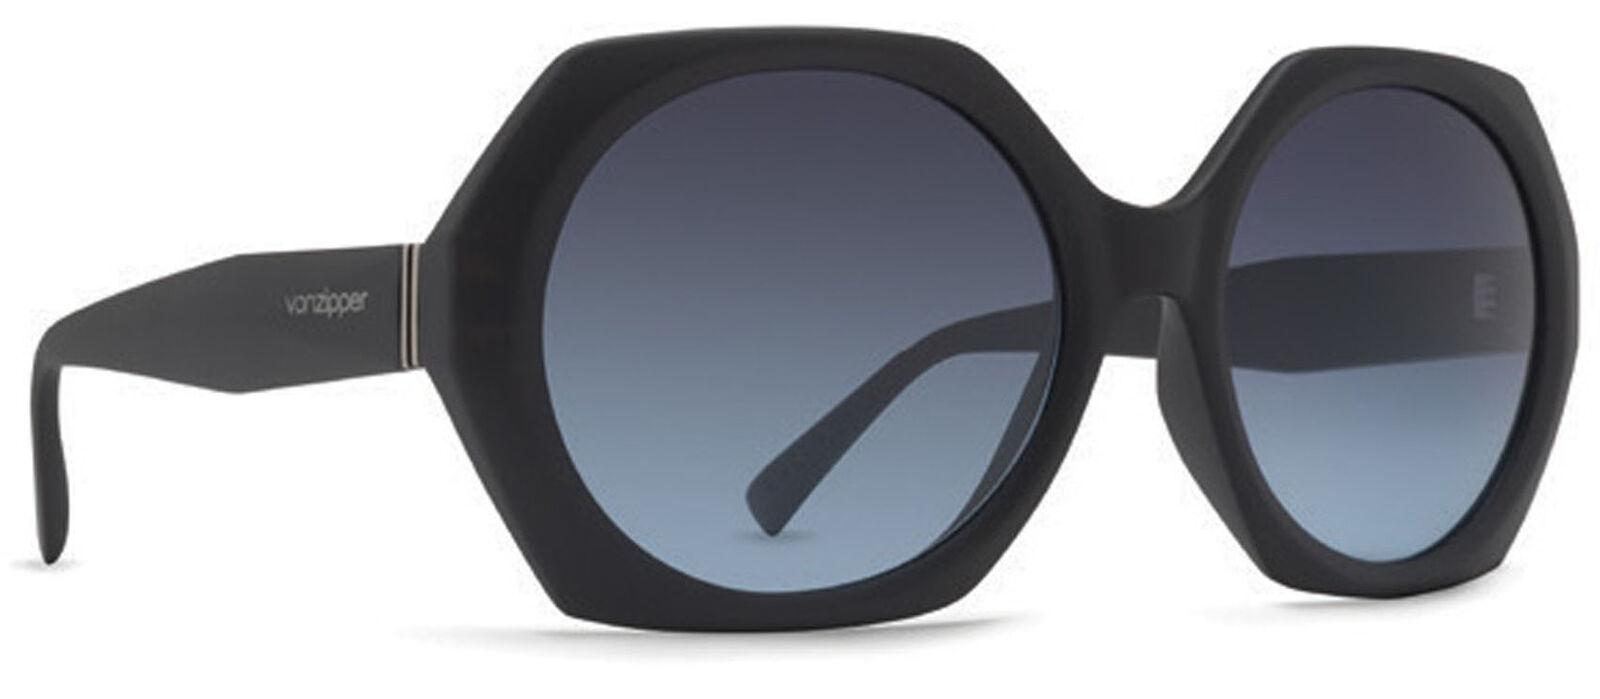 Von Zipper Buelah Grey Blue Gradient Lens Sunglasses, Black Satin